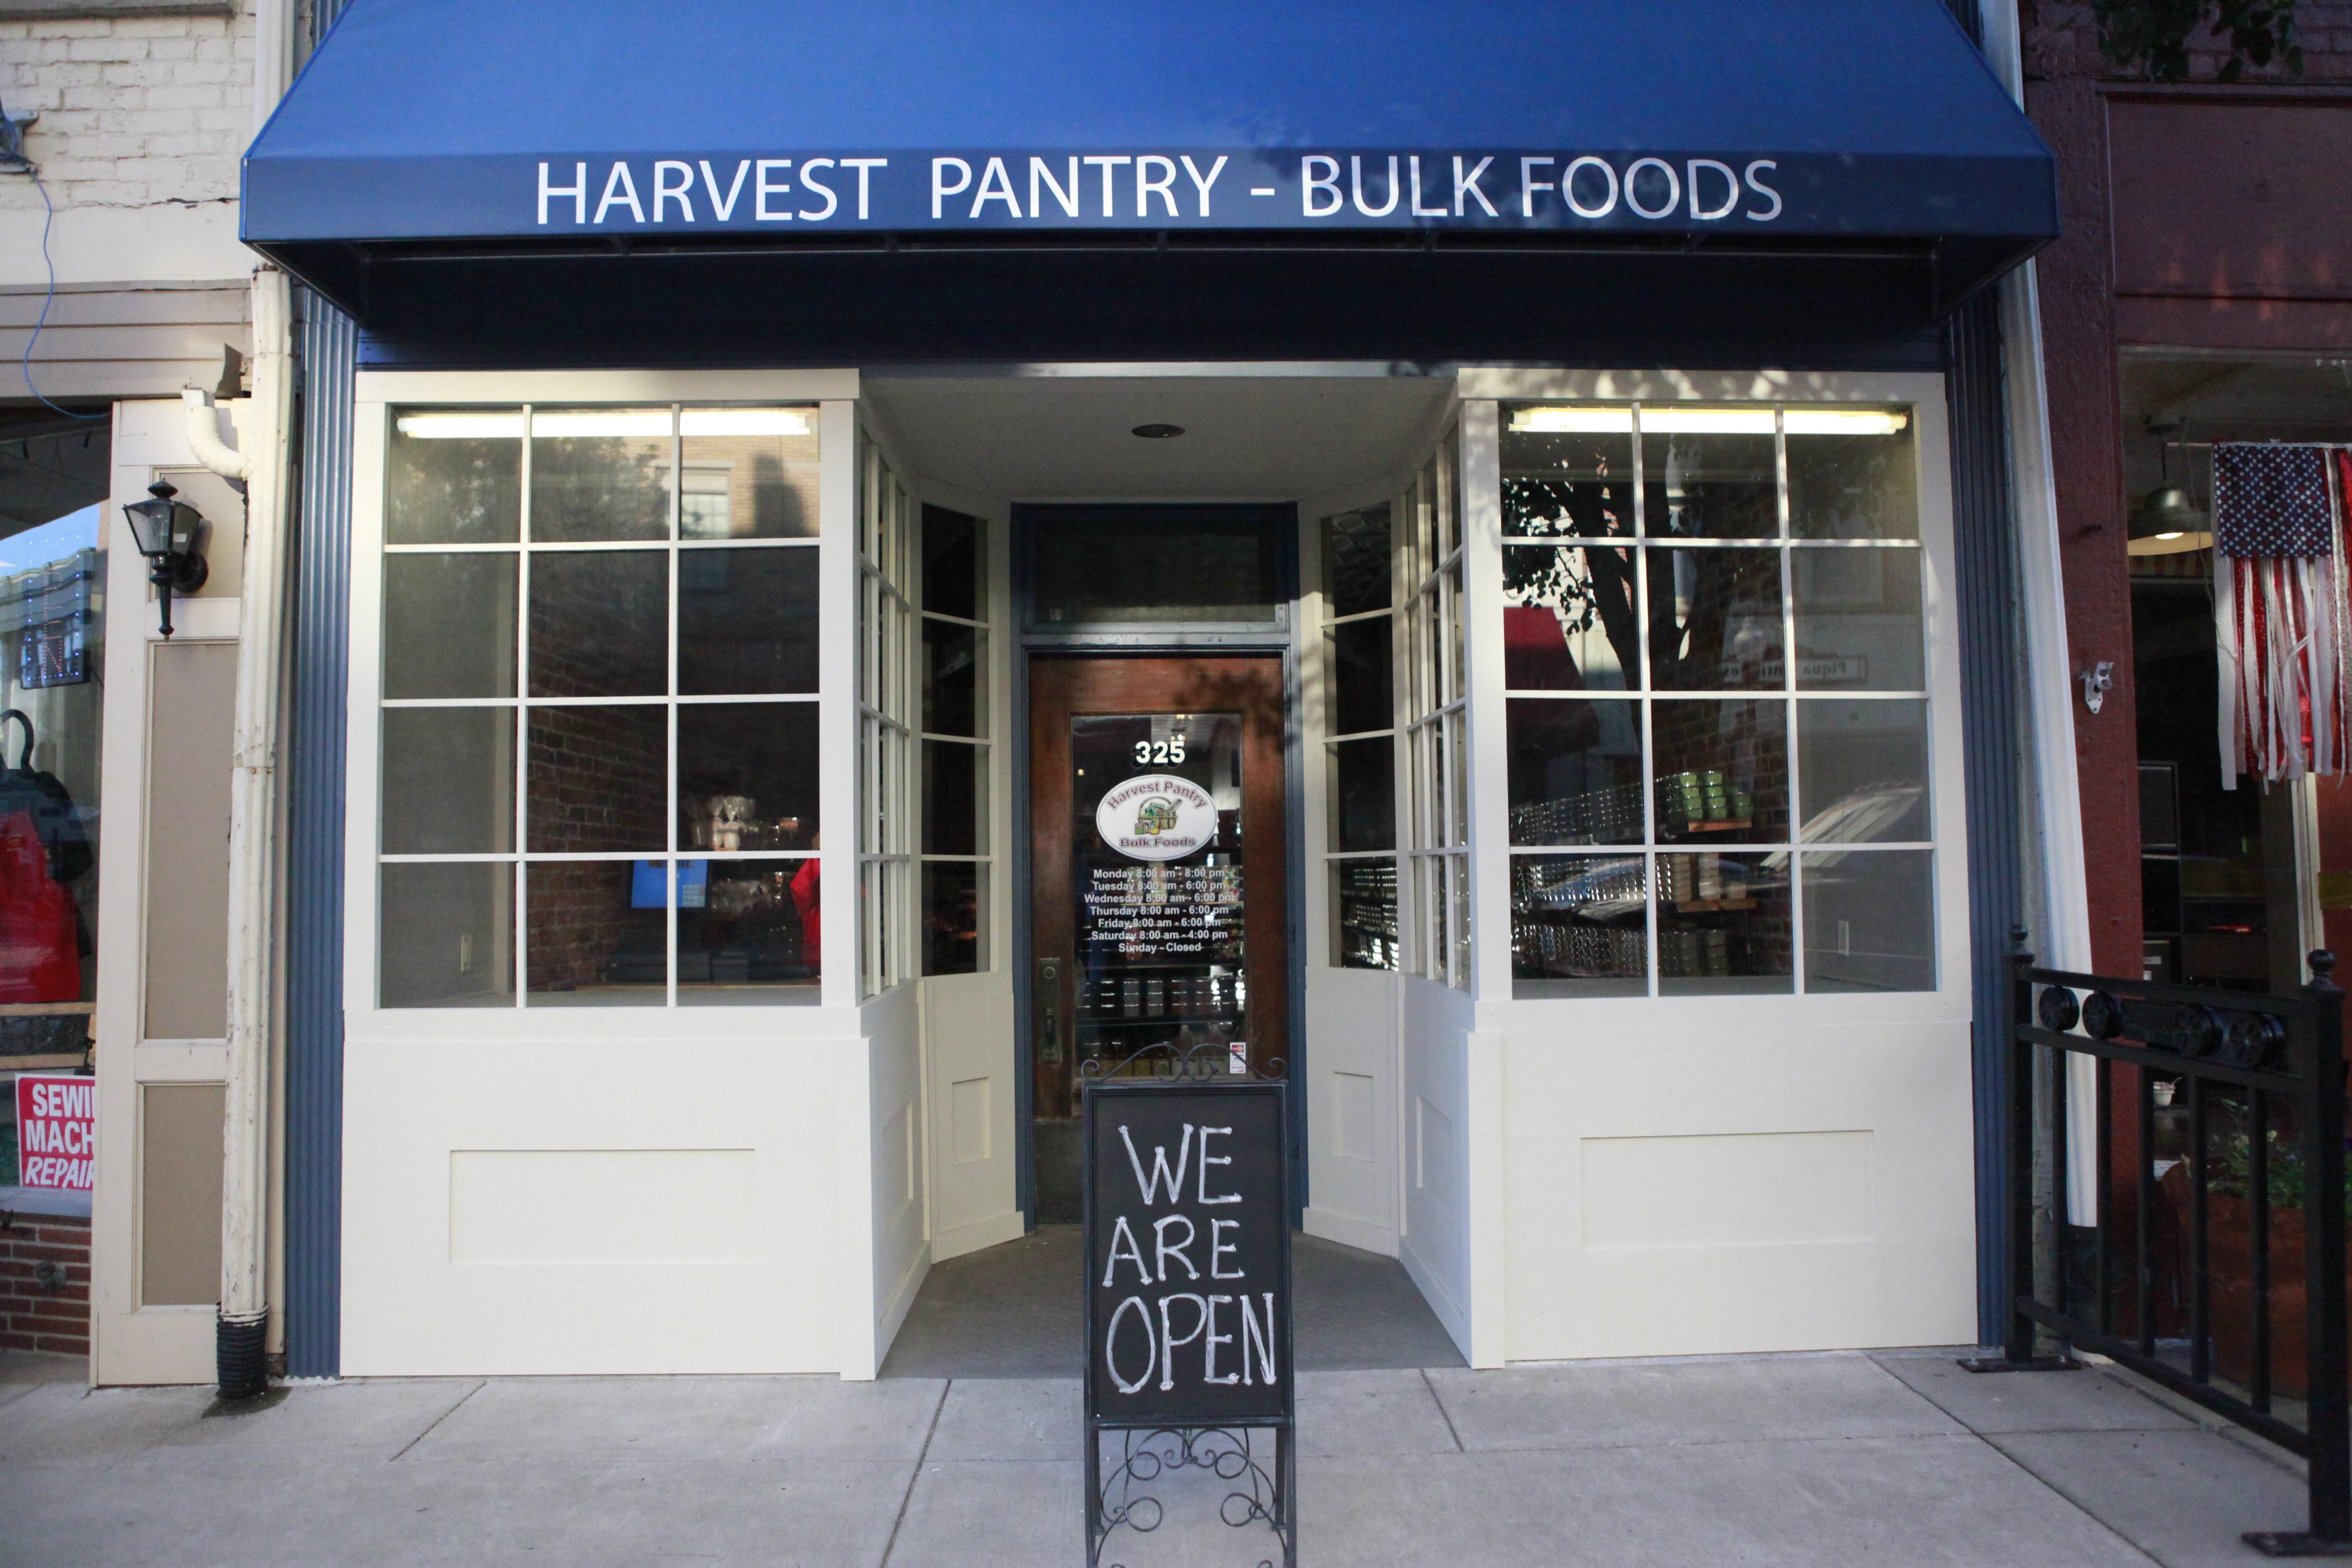 Harvest Pantry LLC - Bulk Foods image 0